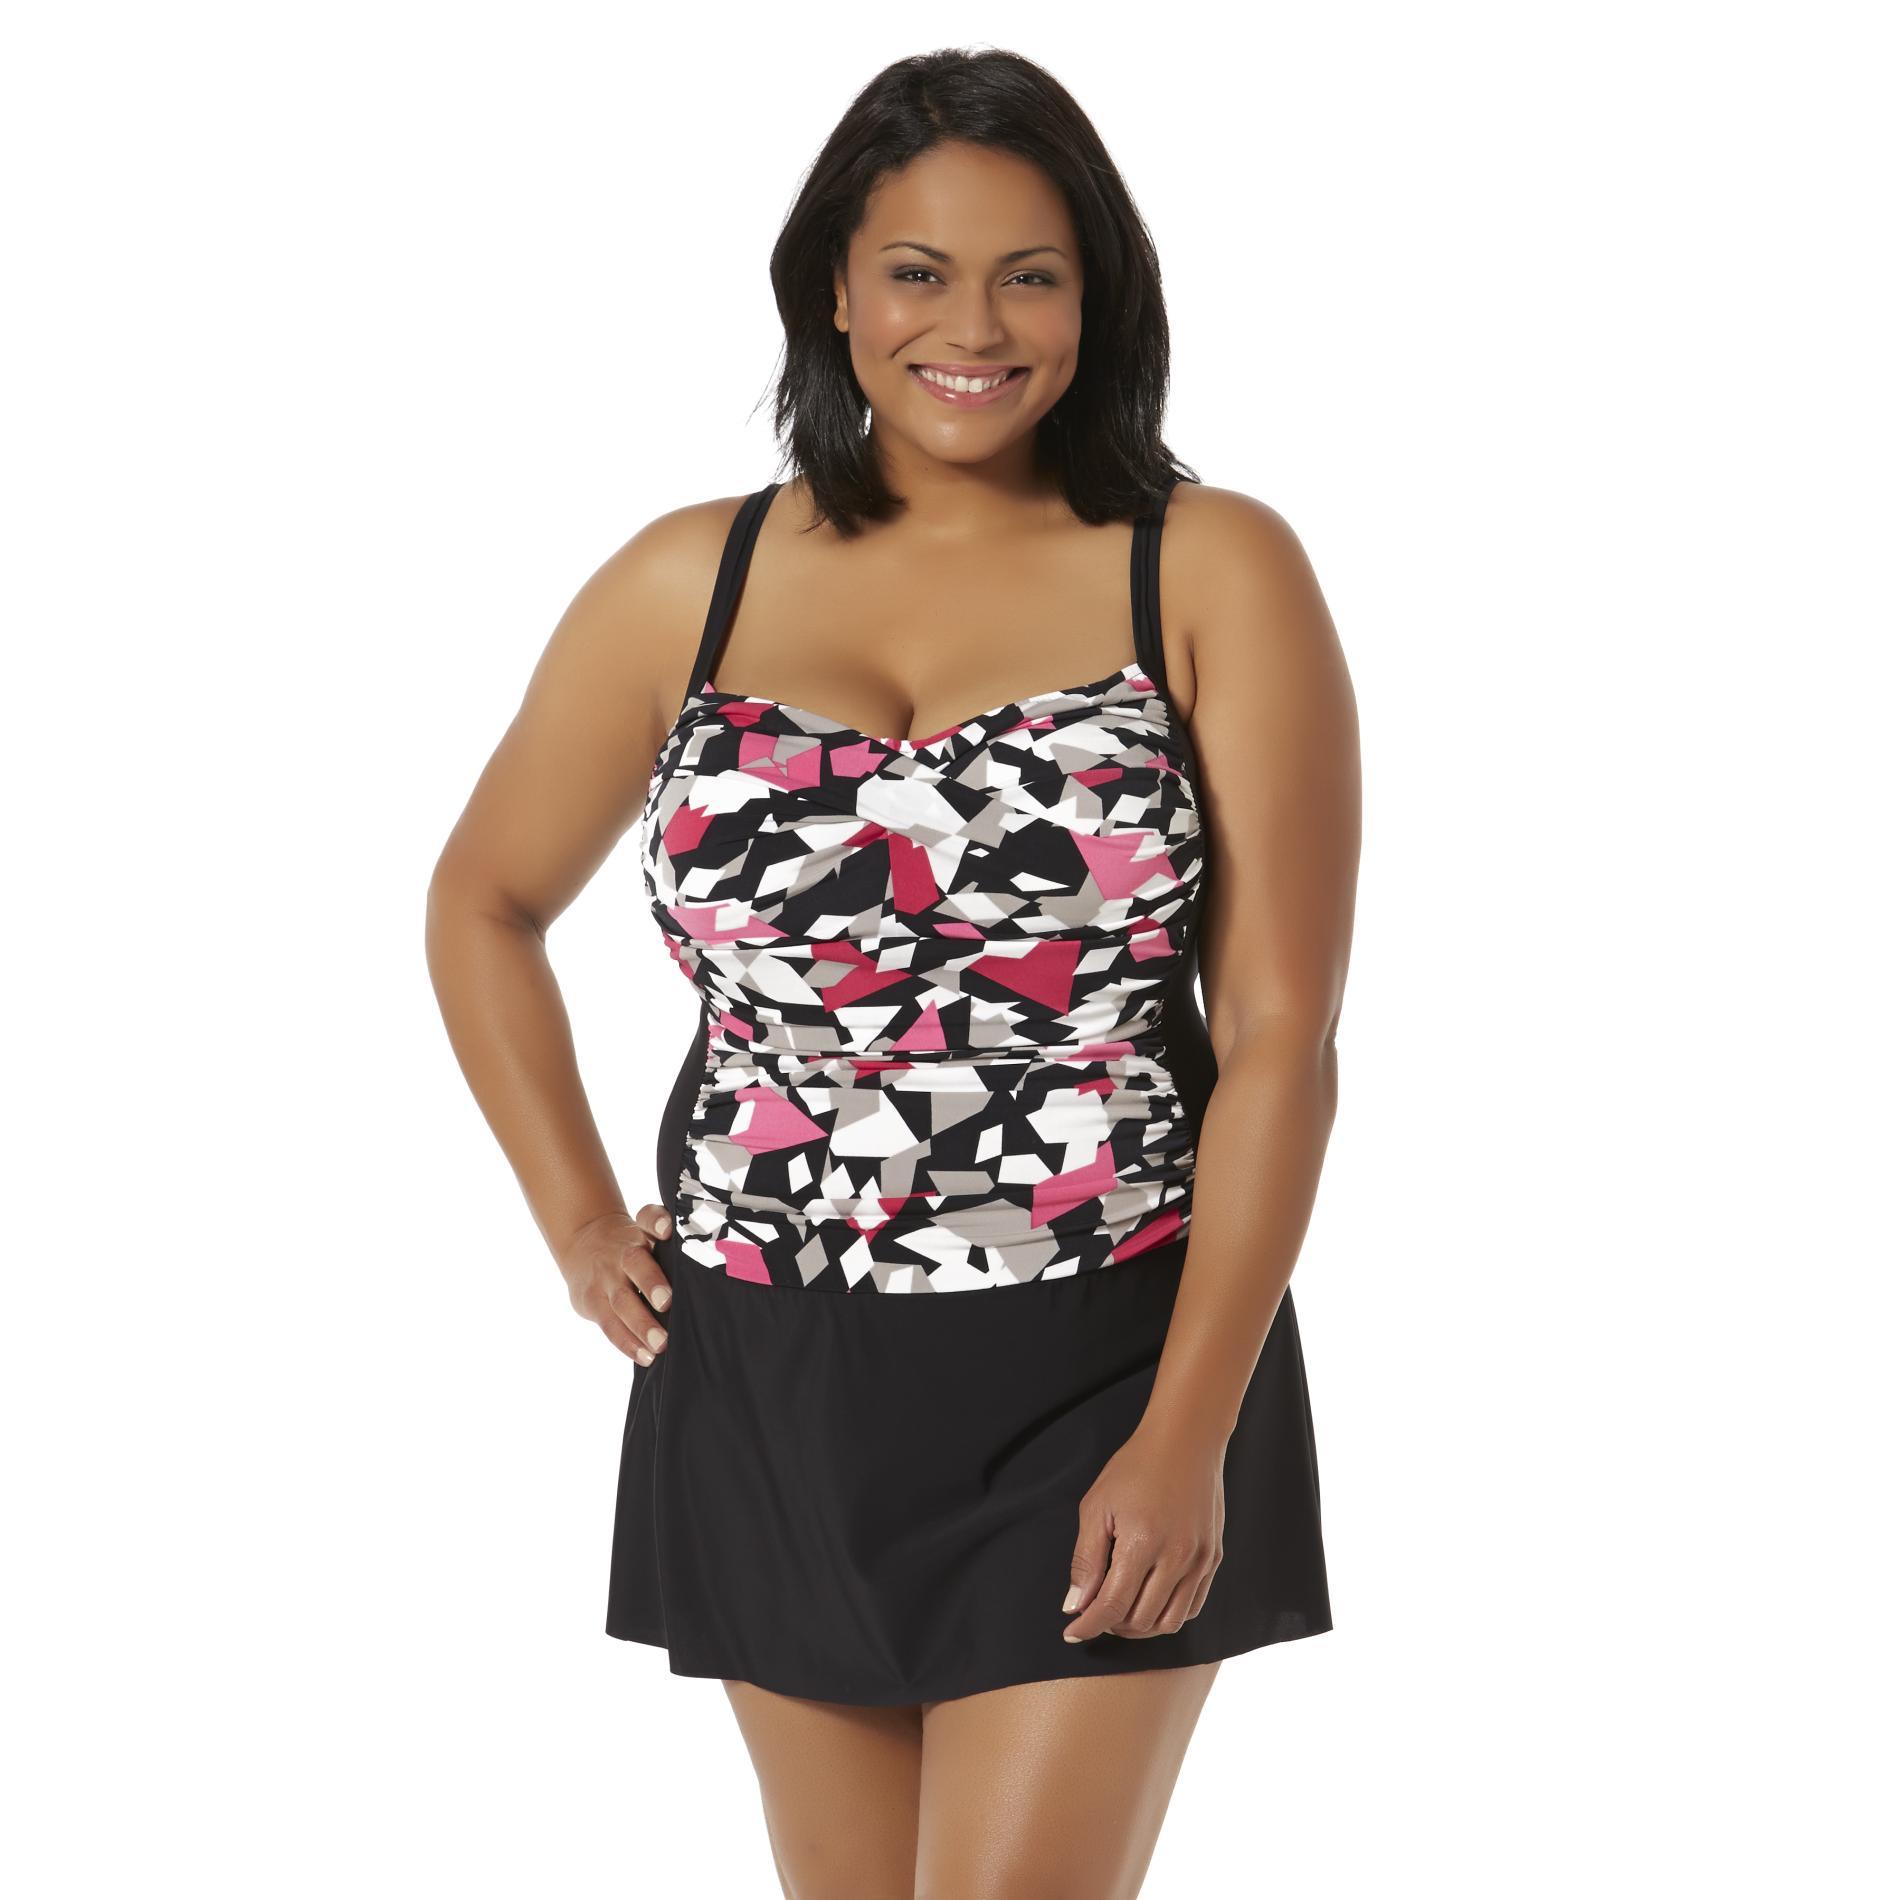 Women's Plus Swim Dress - Abstract Print PartNumber: 017VA86673912P MfgPartNumber: 522209XS